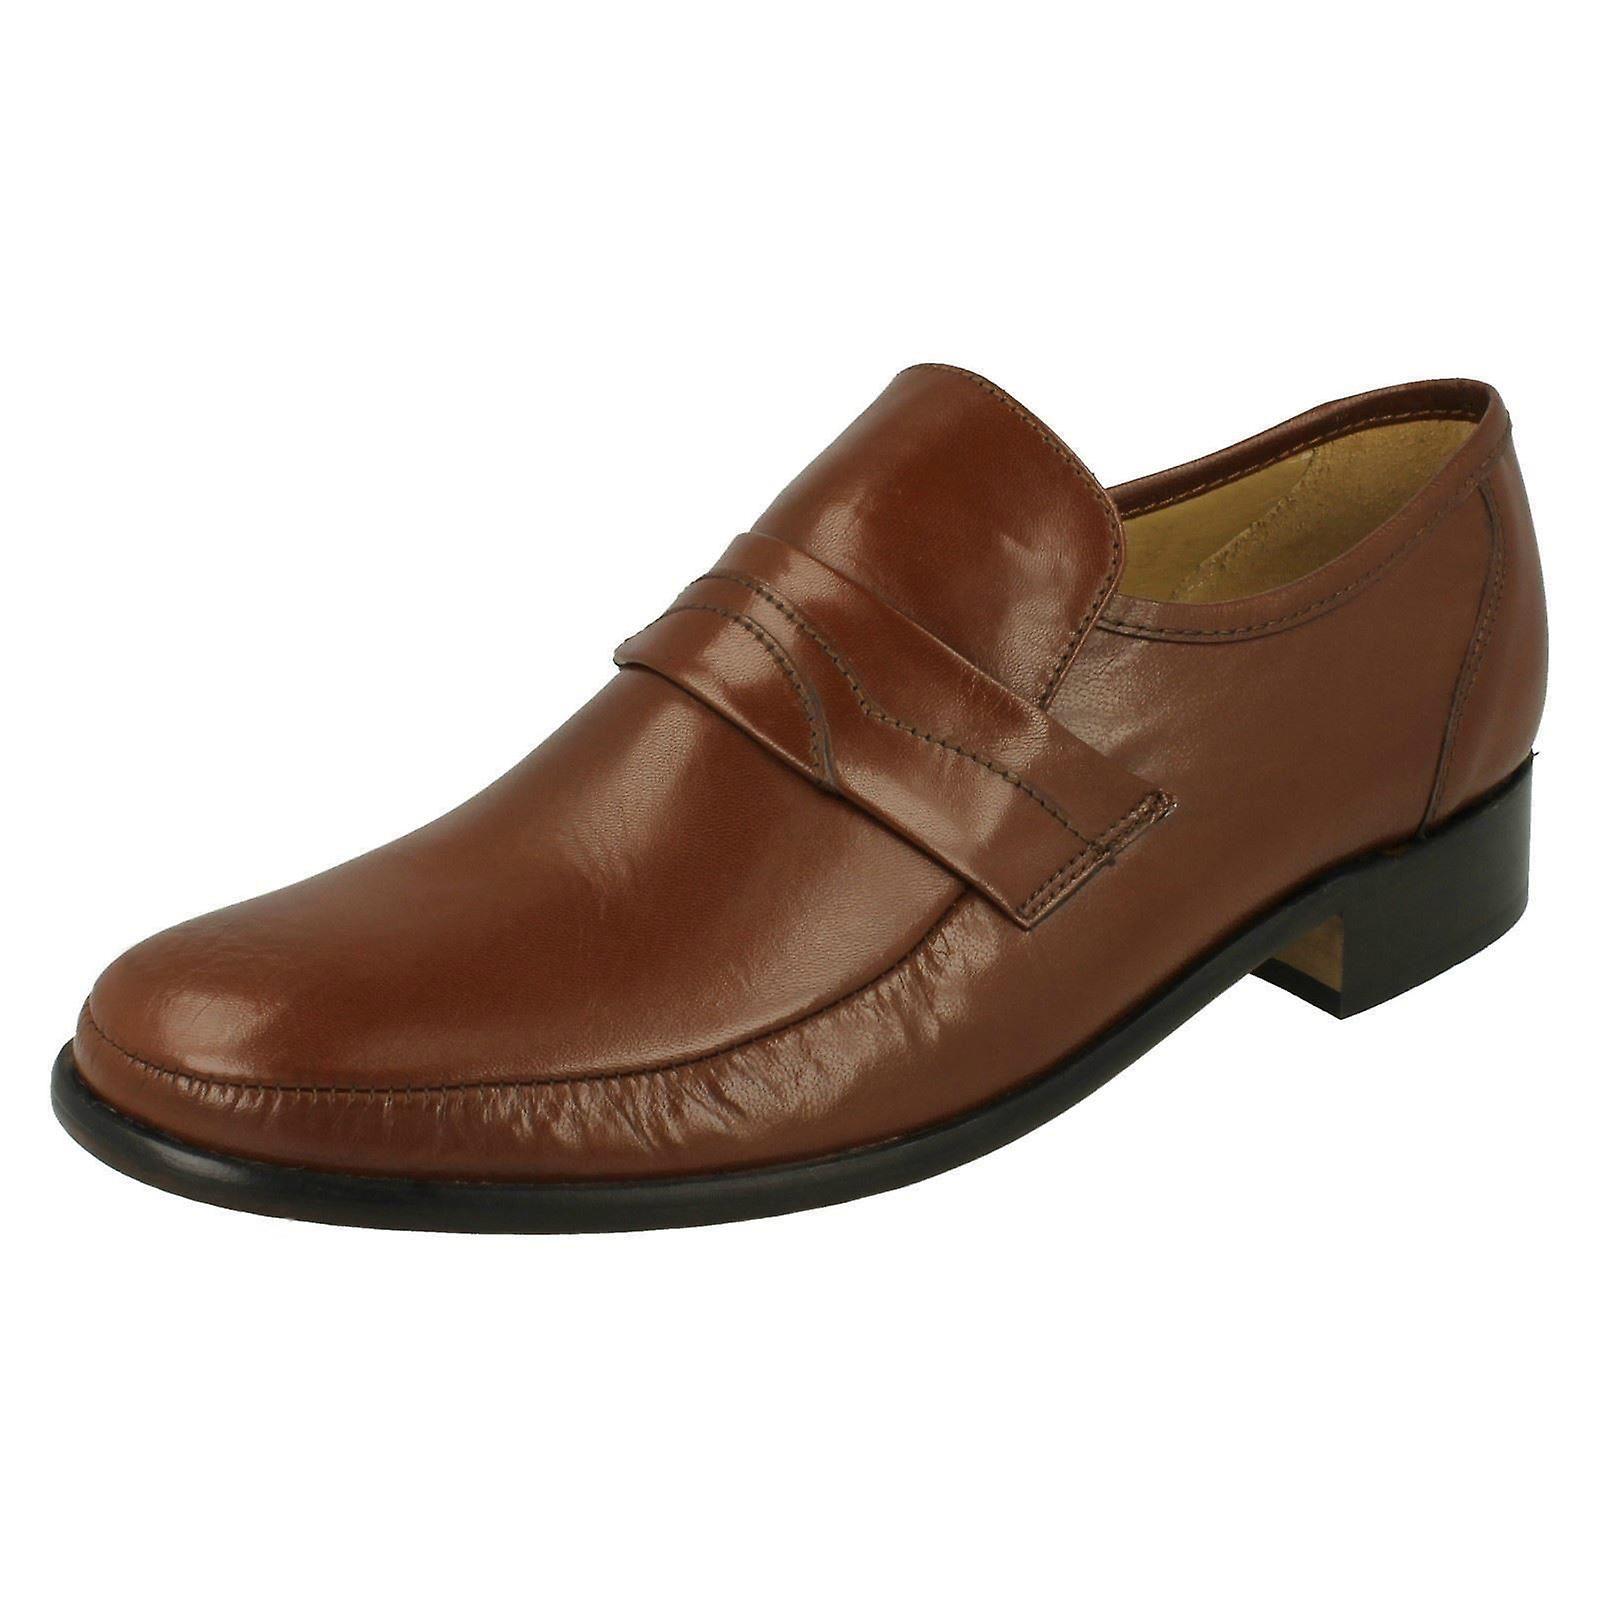 Mens Thomas stumpf auf elegante Schuhe Swindon 2 Rutschen